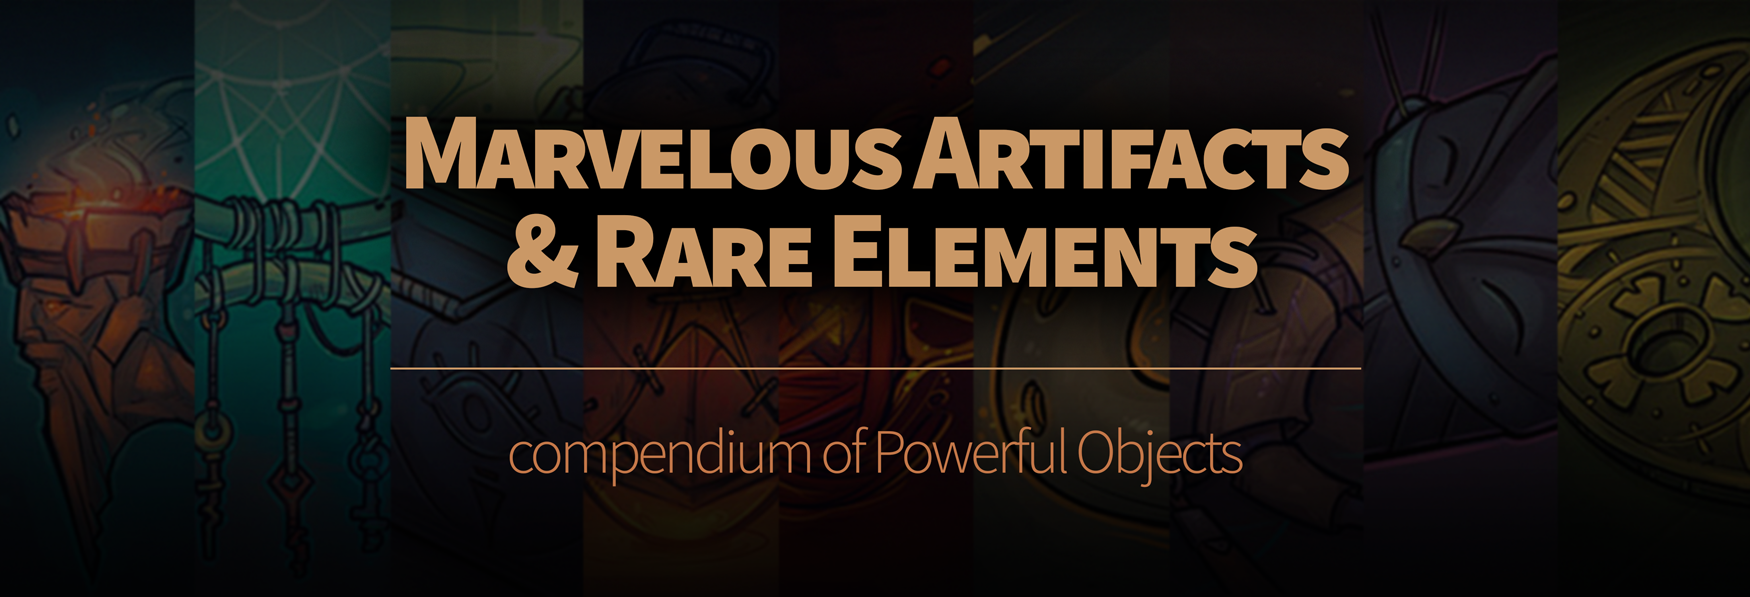 Marvelous Artifacts & Rares Elements